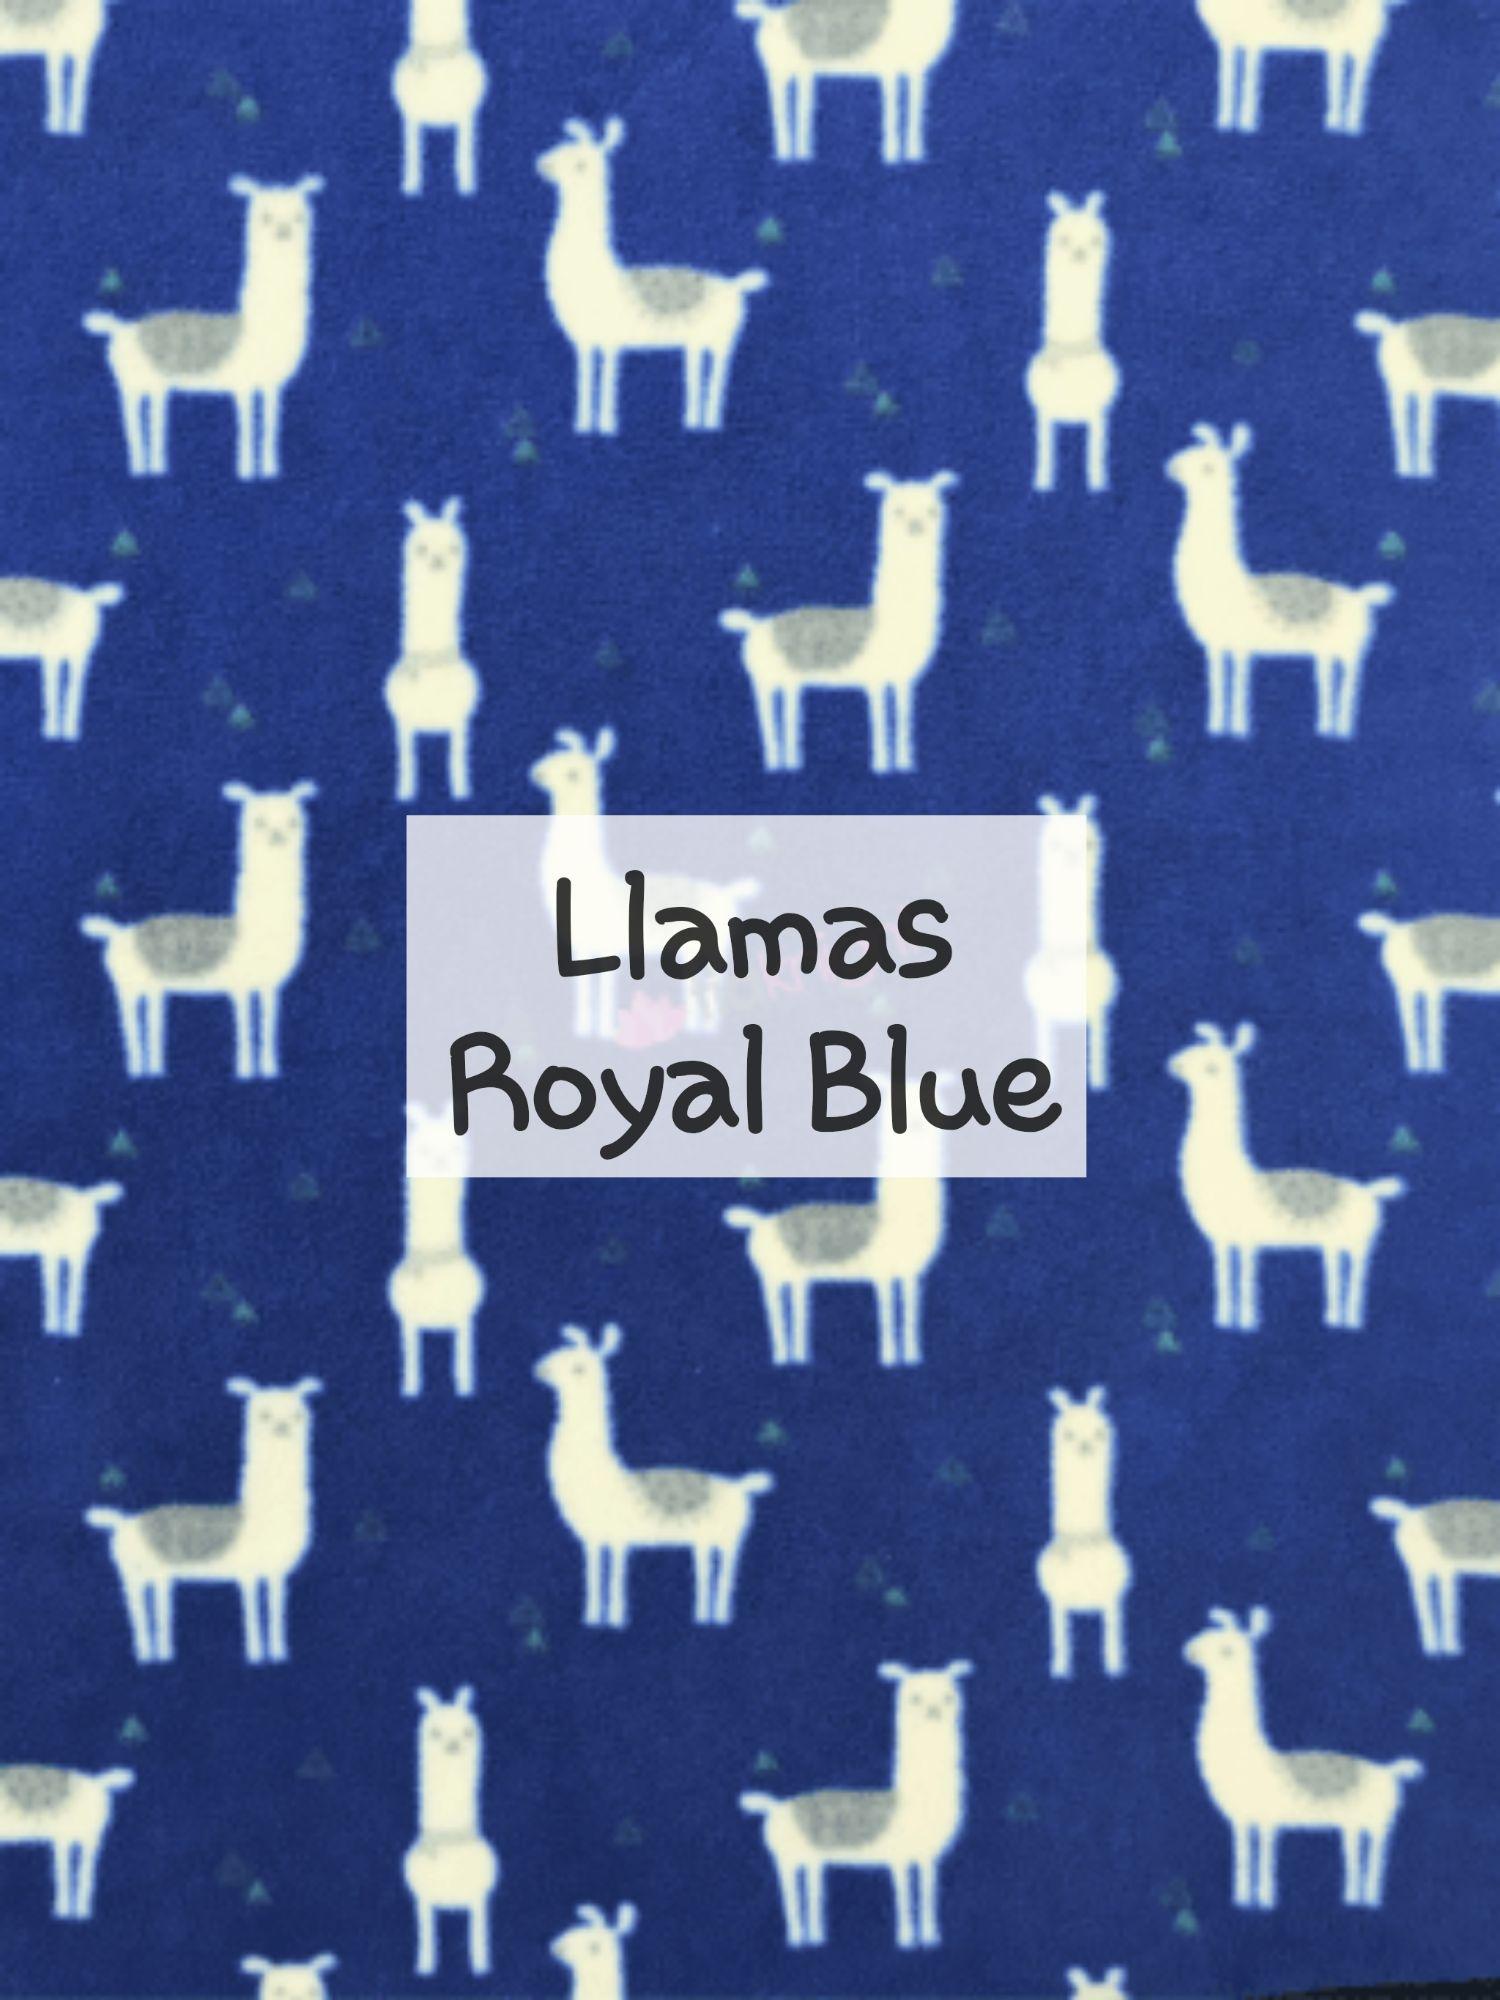 Llamas Royal Blue fleece